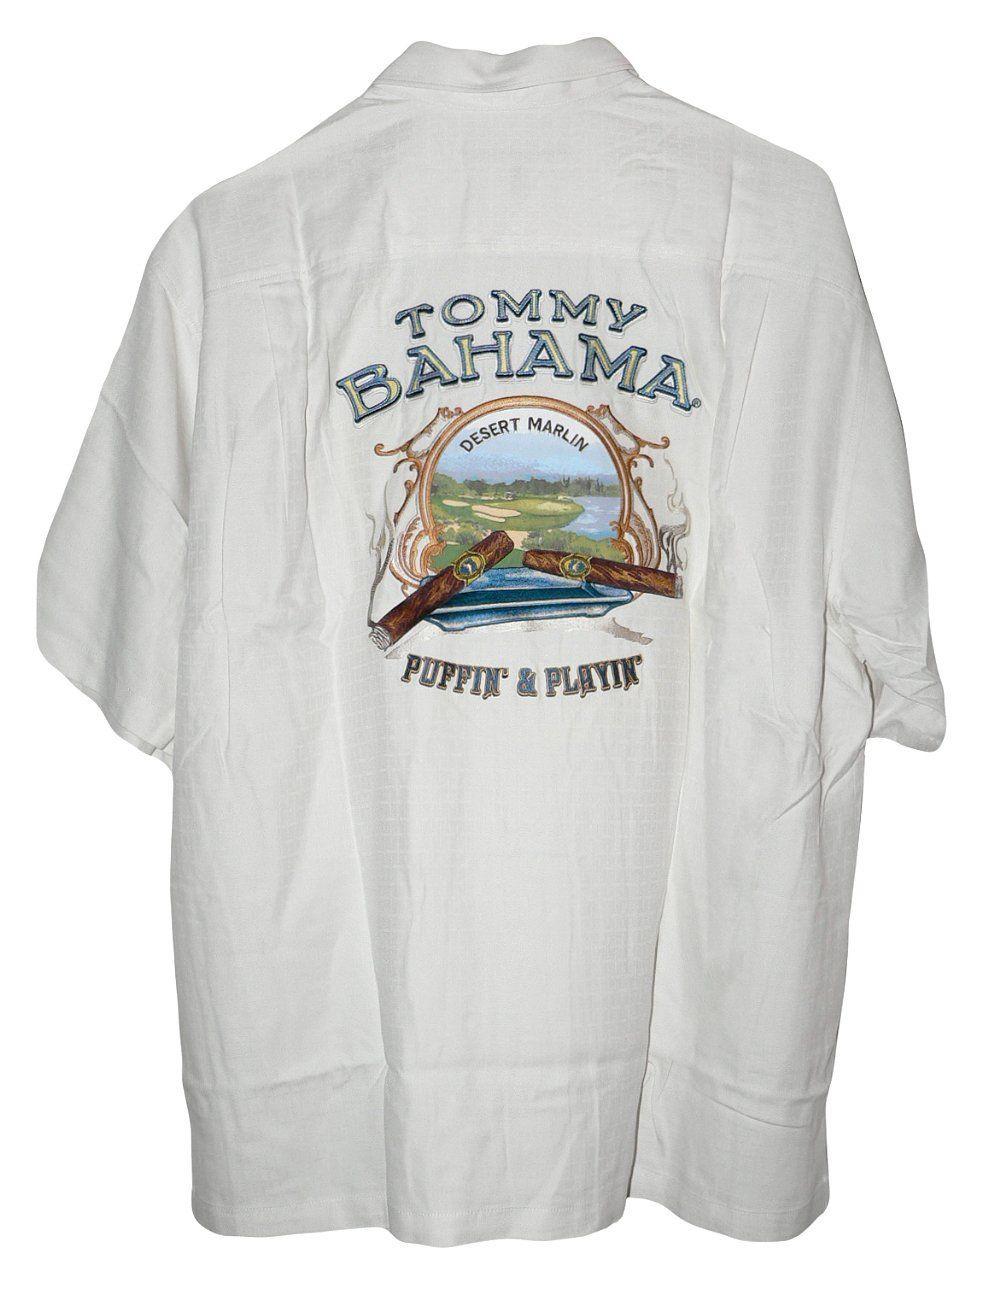 Tommy Bahama Embroidered Desert Marlin Puffin And Playin Silk Camp Shirt Clothing Camping Shirt Tommy Bahama Shirts